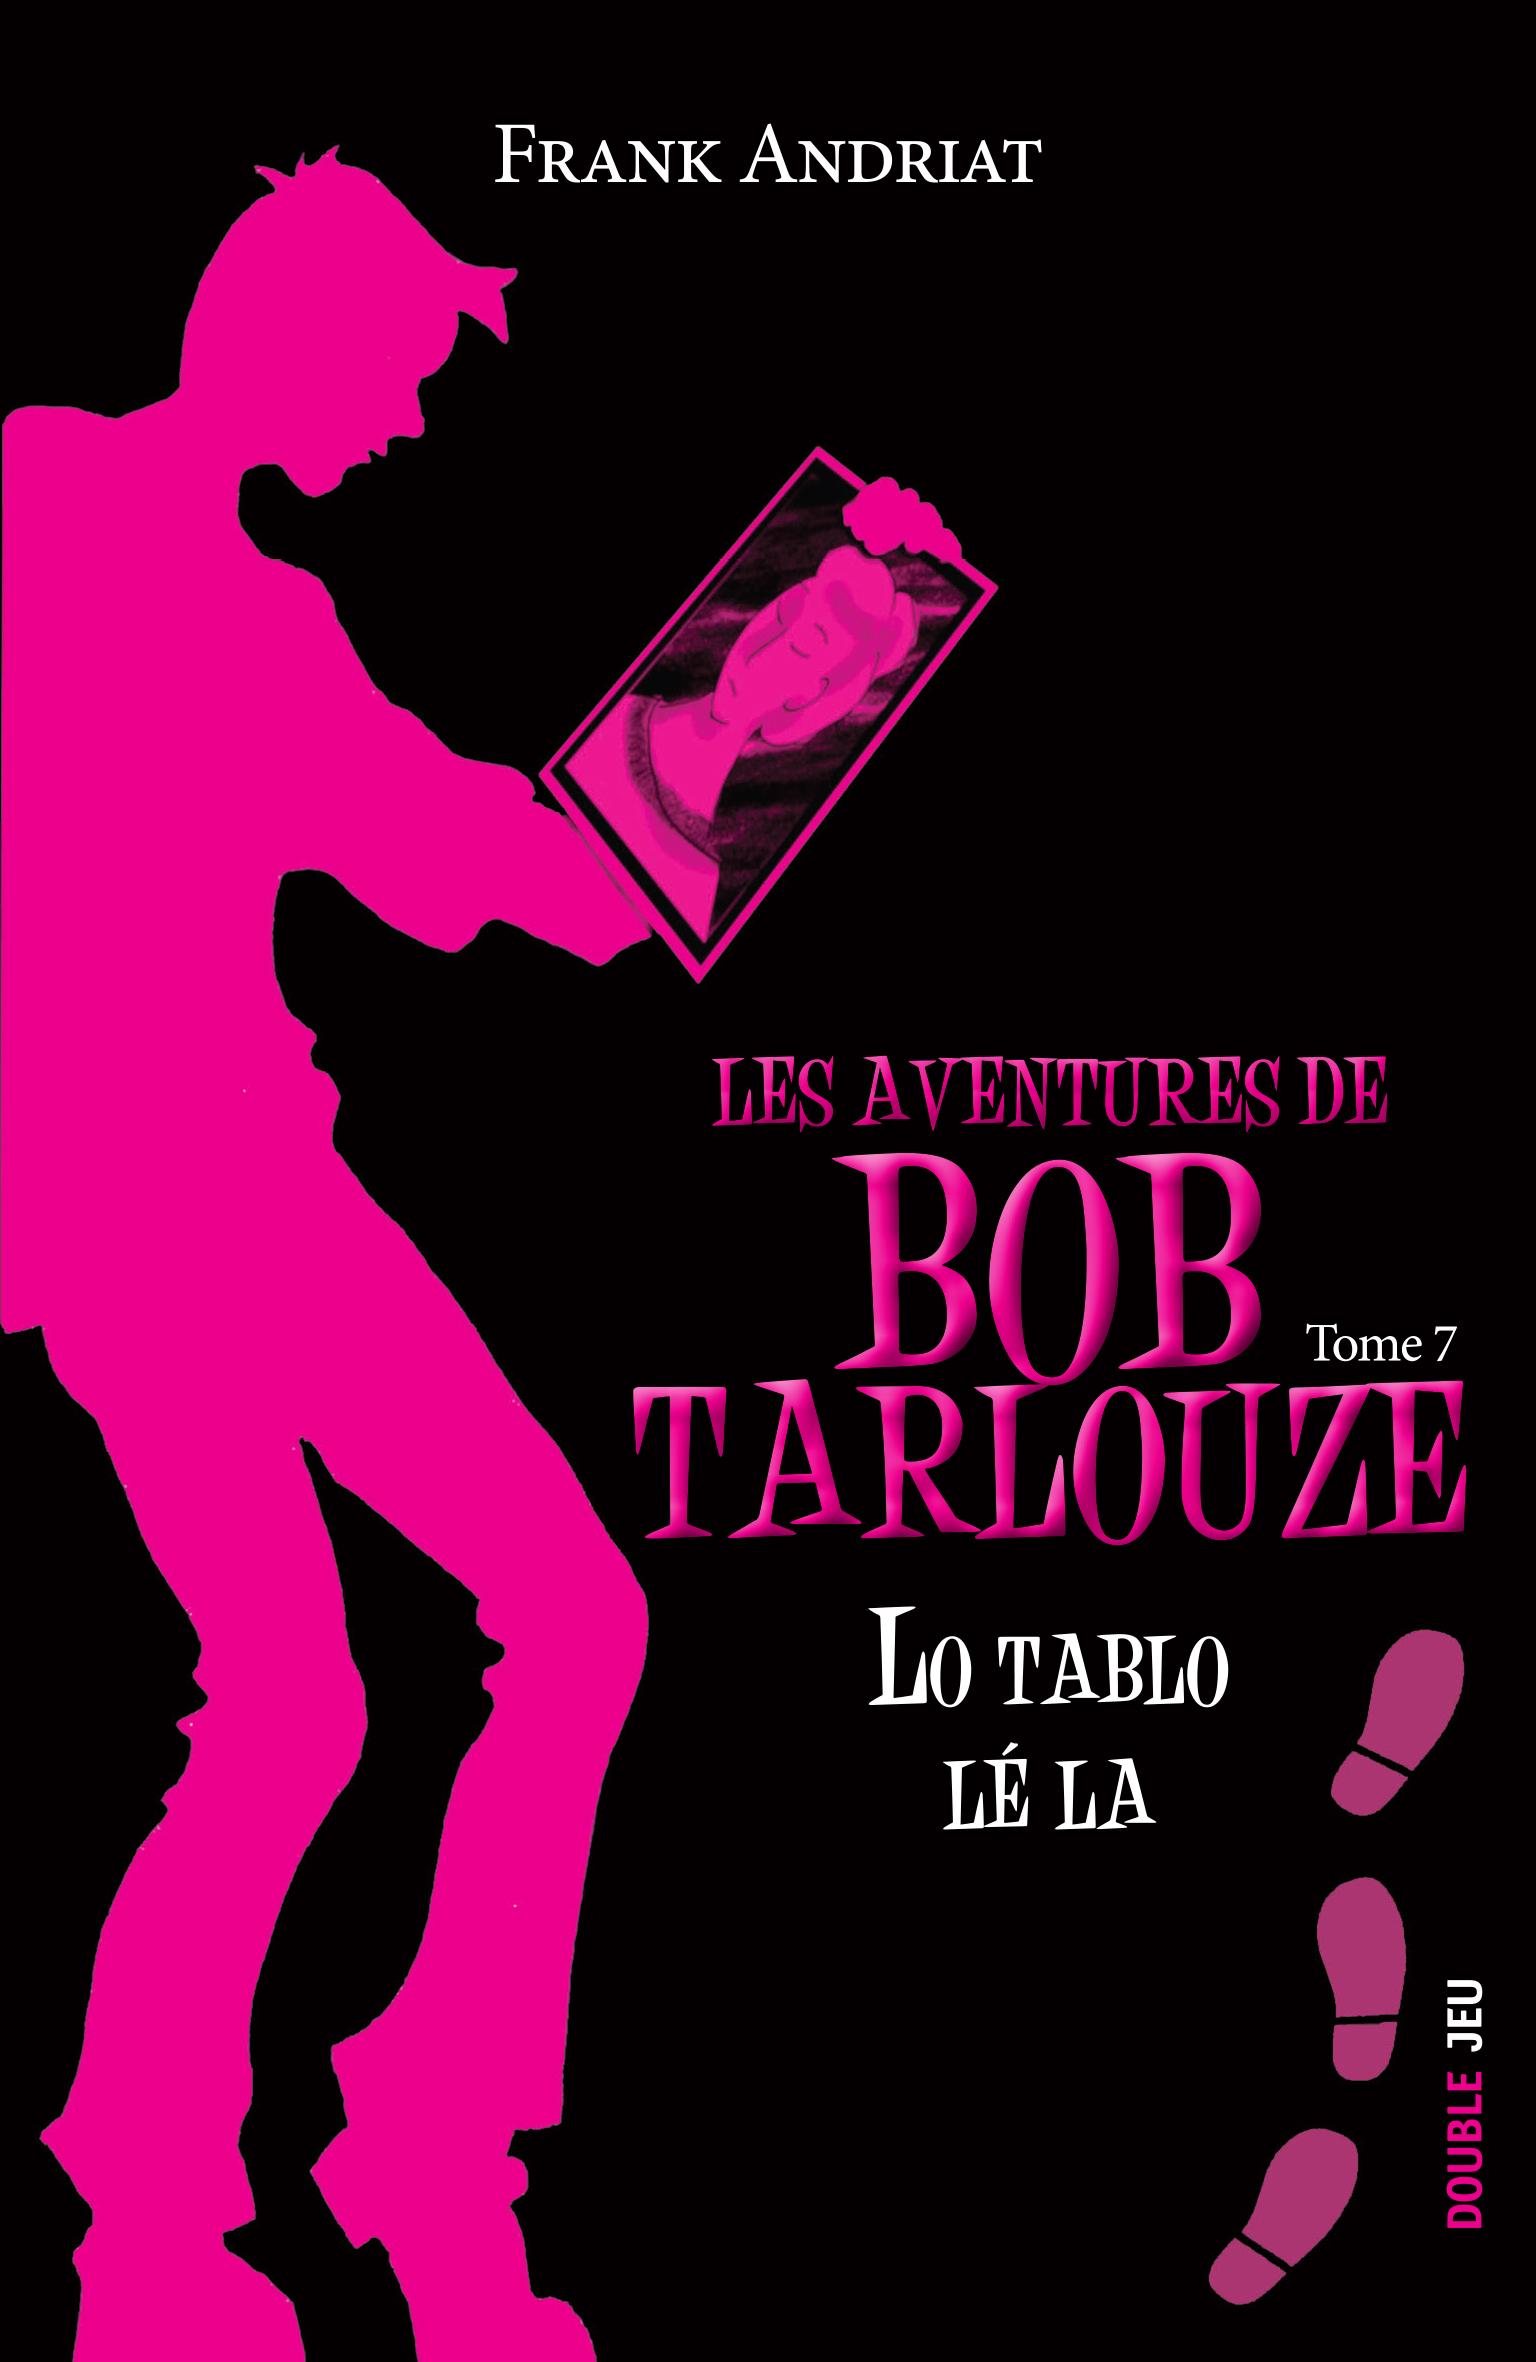 Les aventures de Bob Tarlouze — Tome 7 — Lo tablo lé la